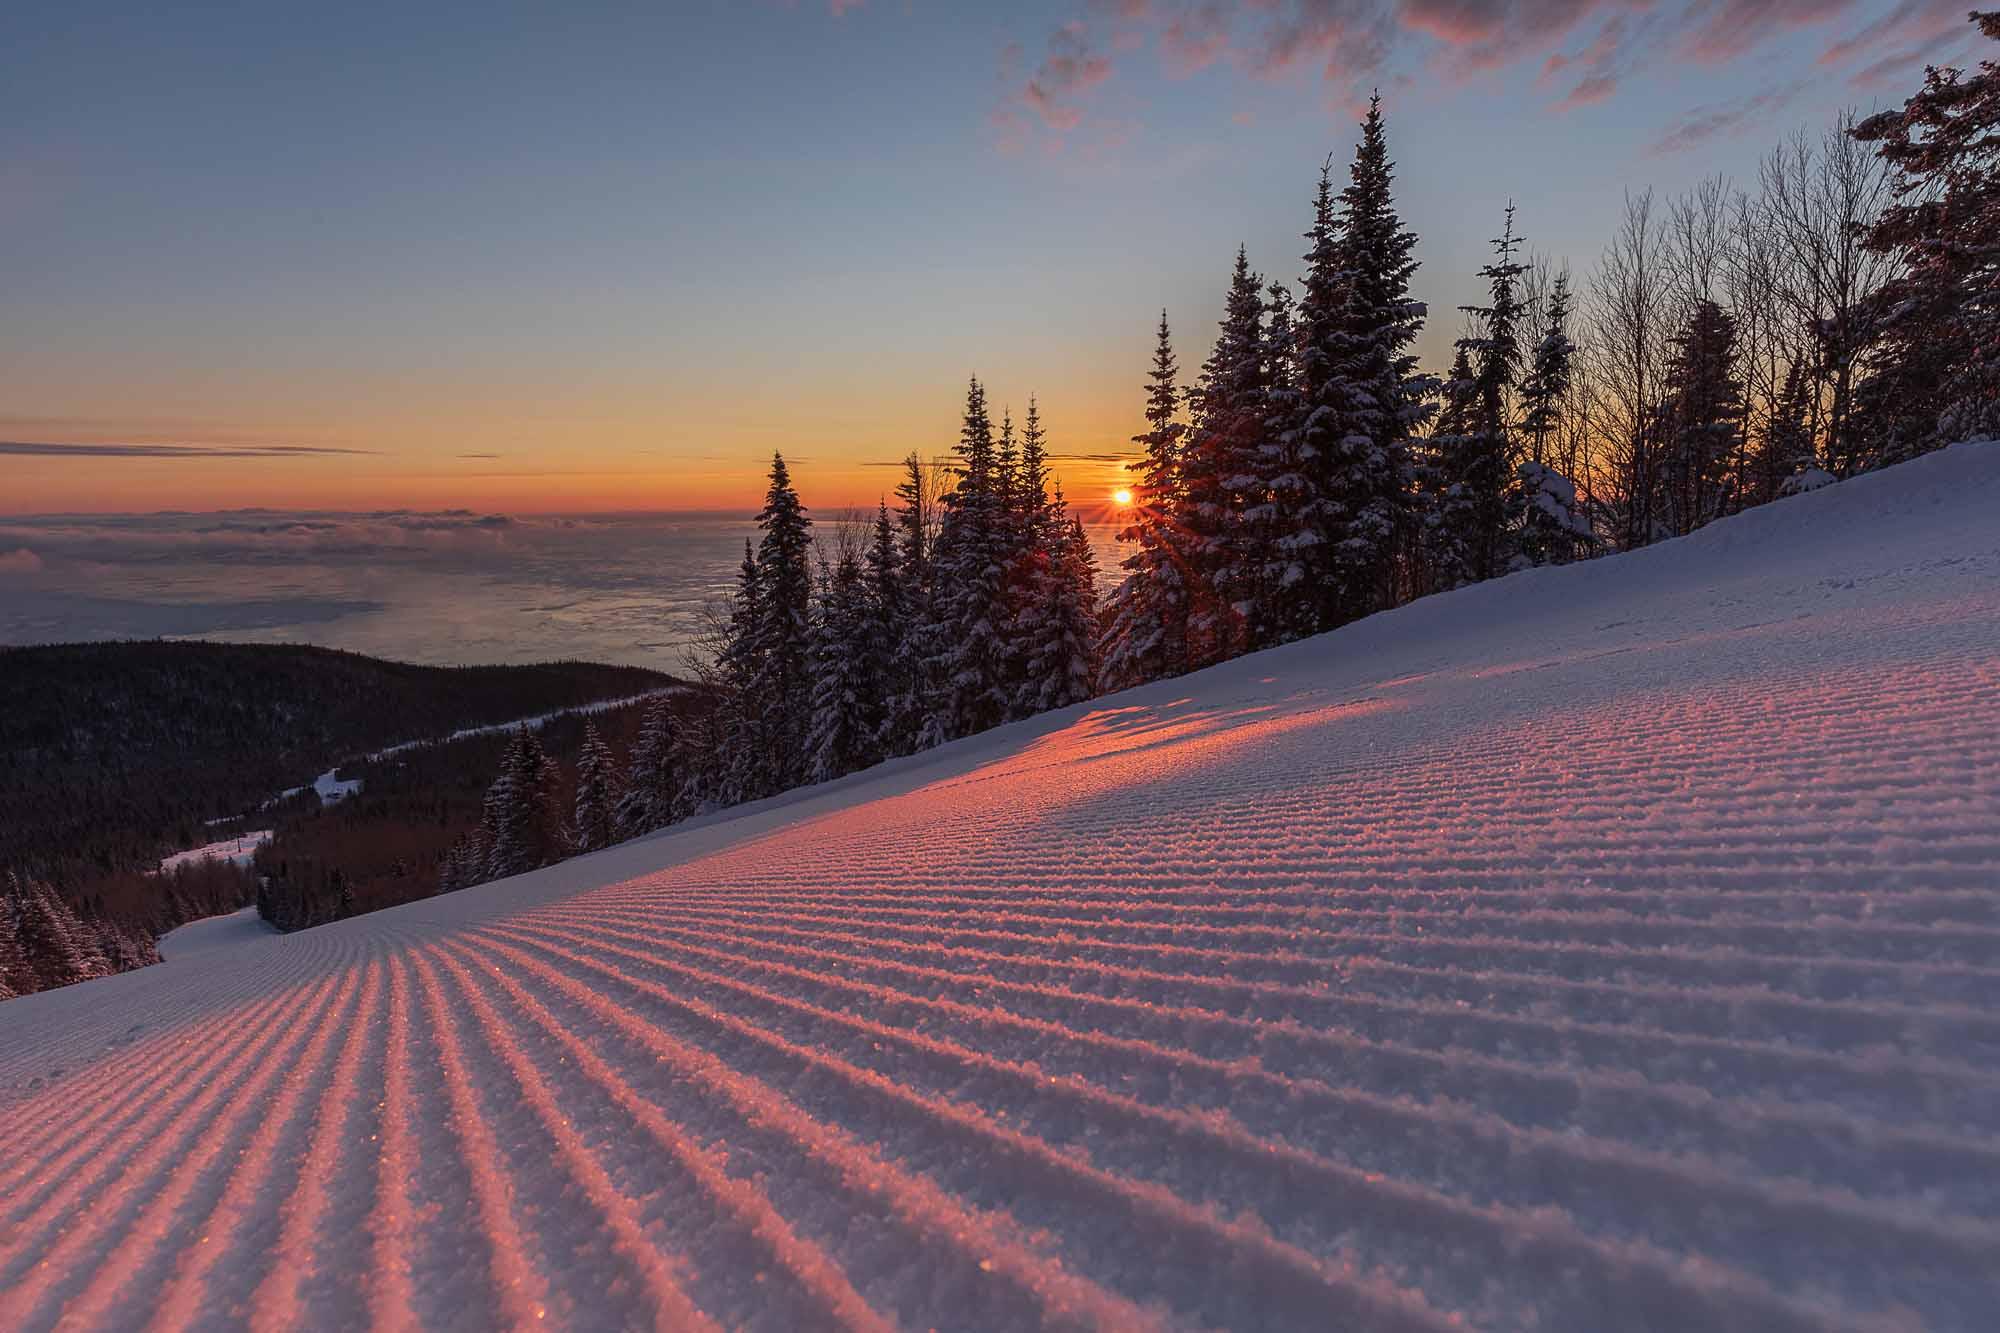 Quebec-Winter-Showcase-Le-Massif-de-Charlevoix-photo-by-ALAIN-BLANCHETTE